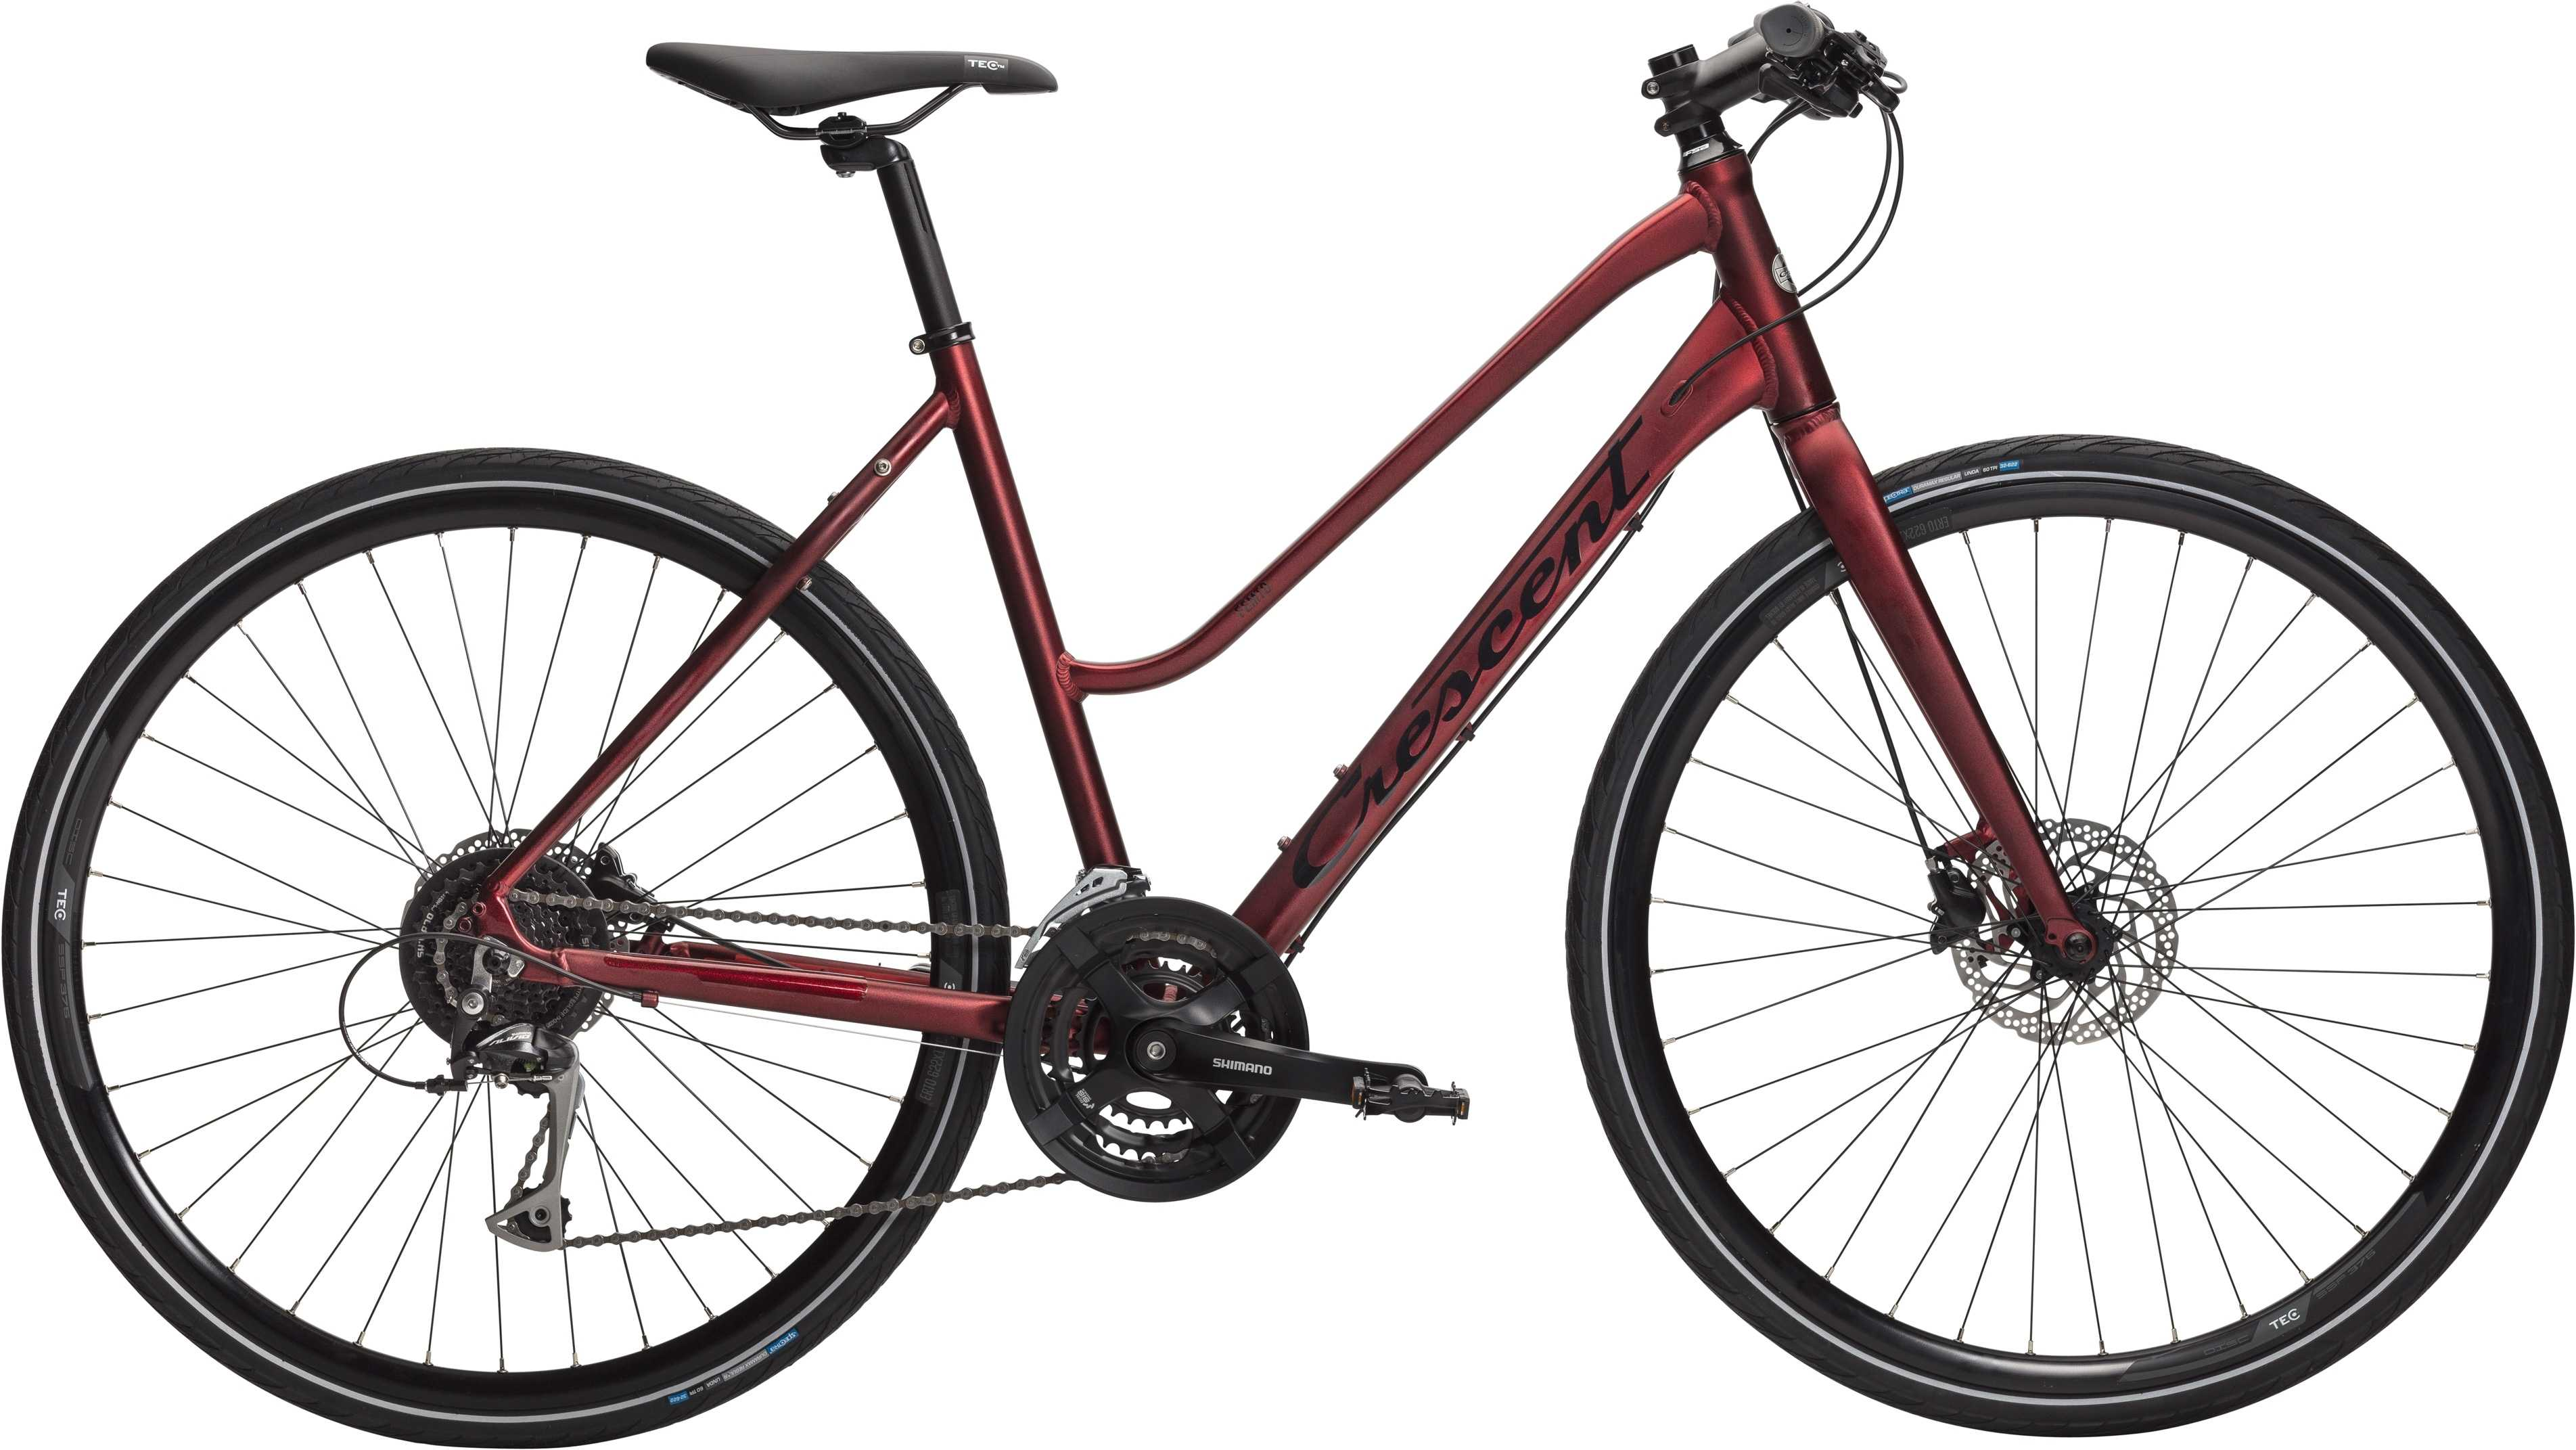 Crescent Femto matt röd metallic 55 cm